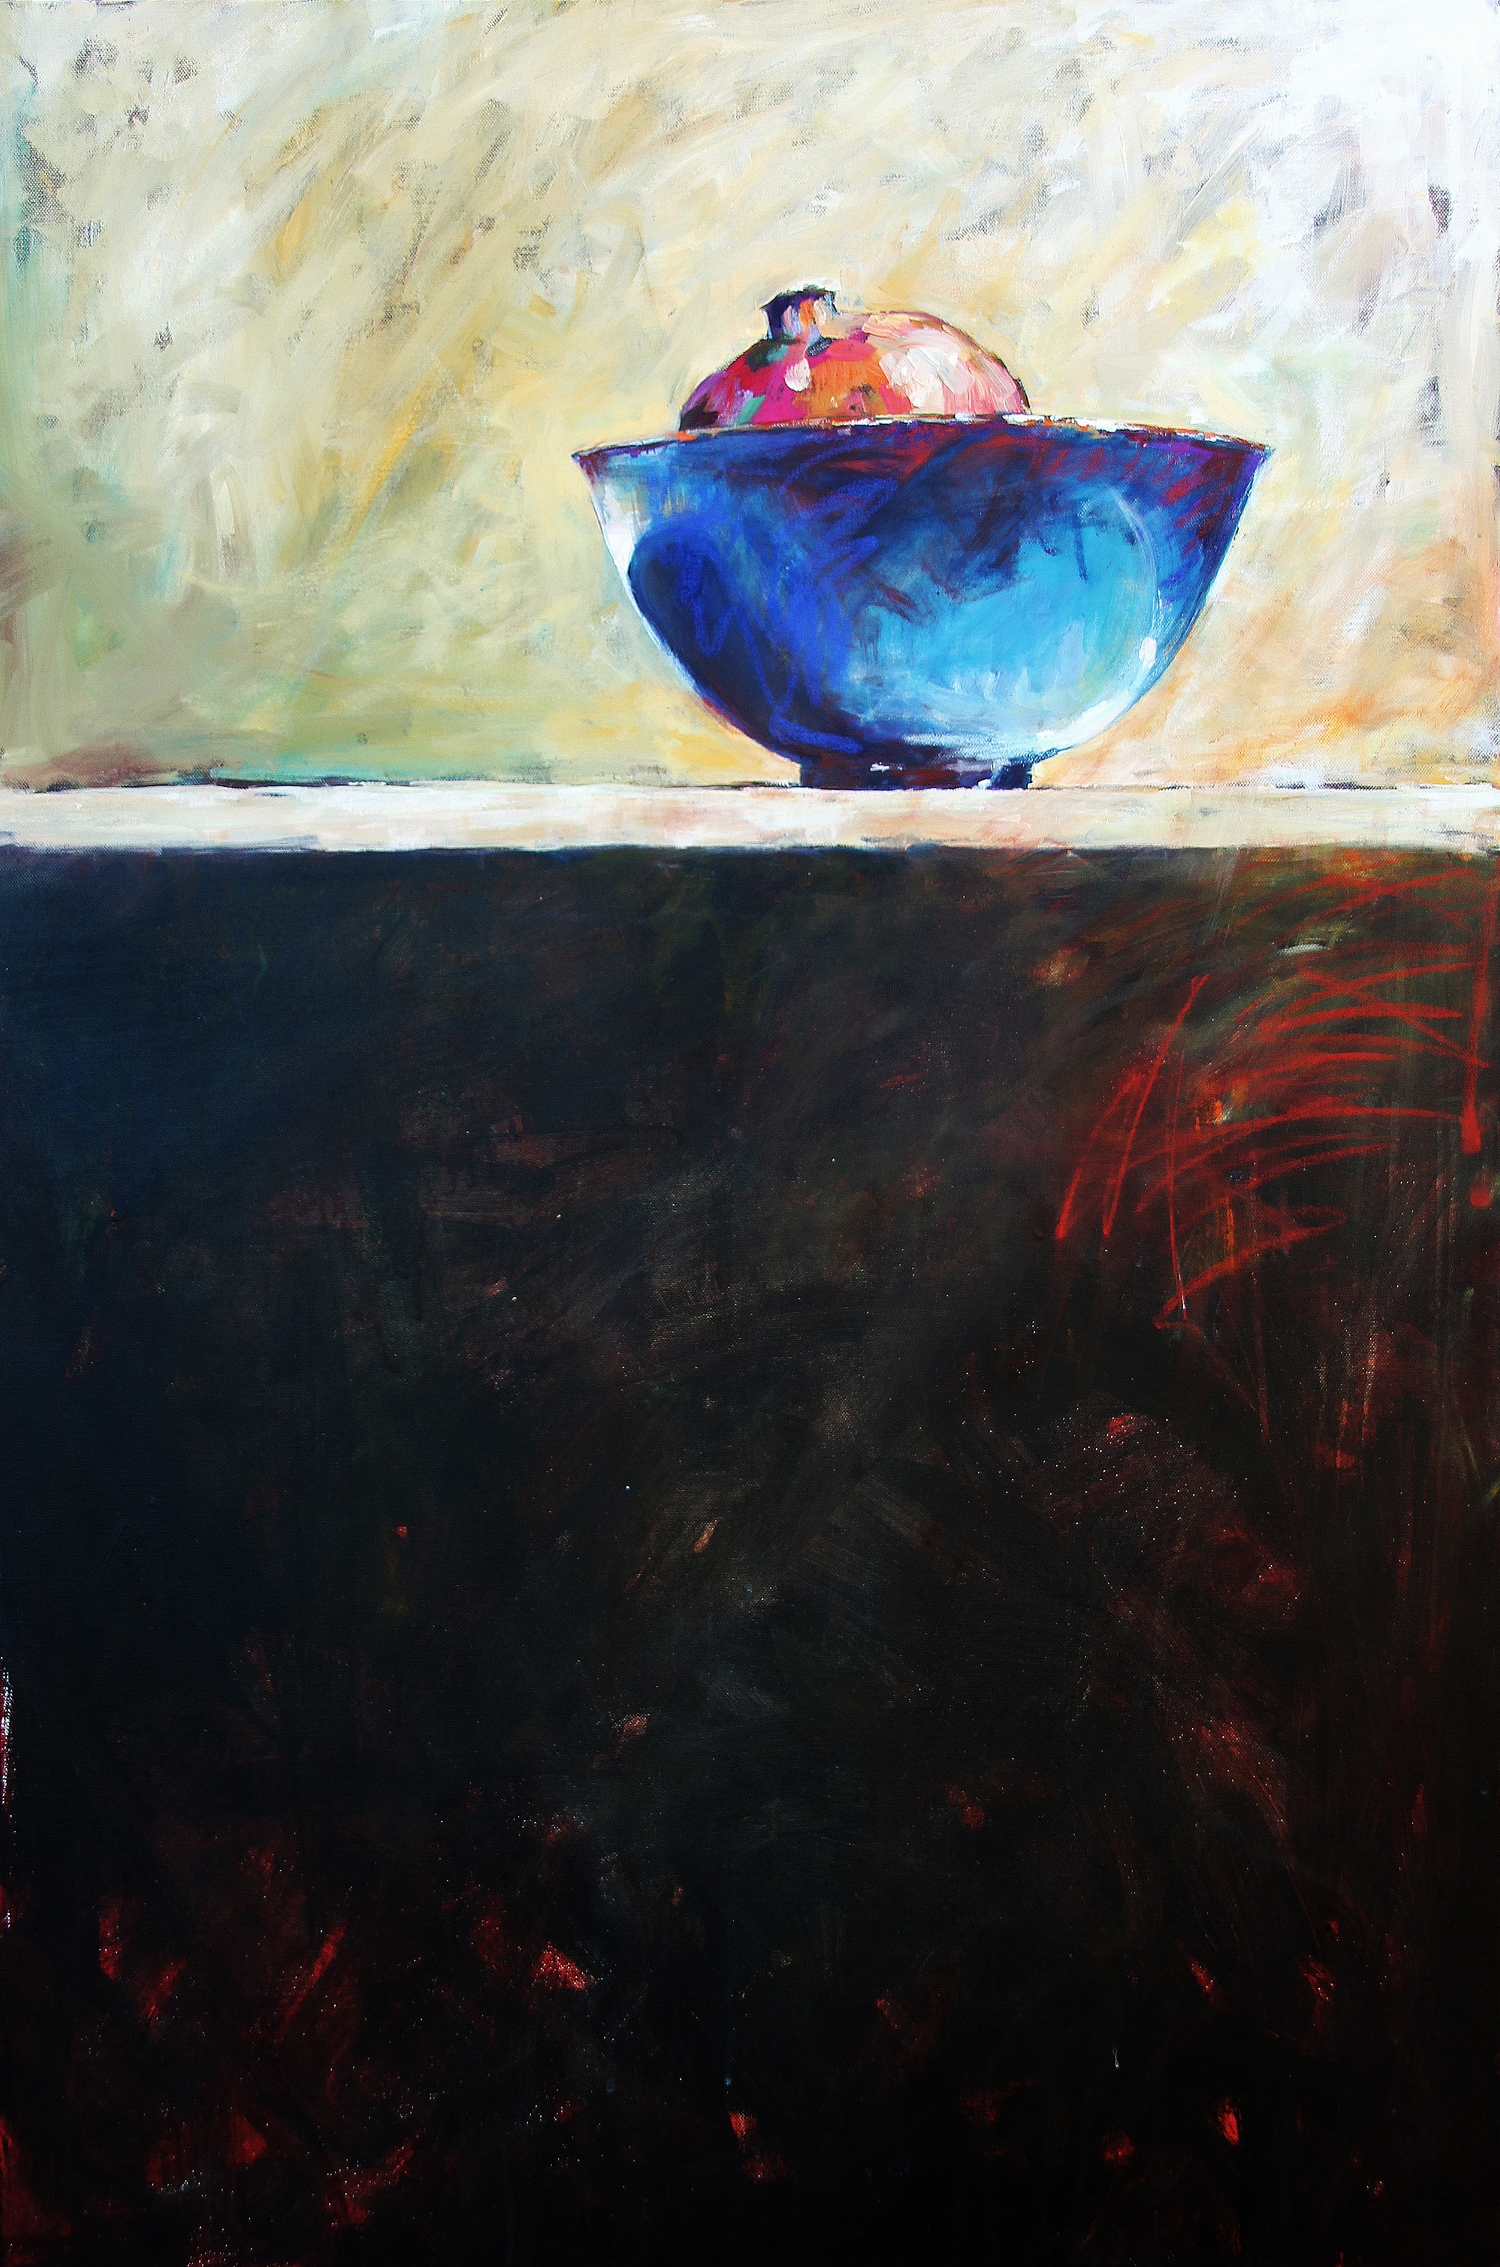 A Pomegranate in a blue bowl